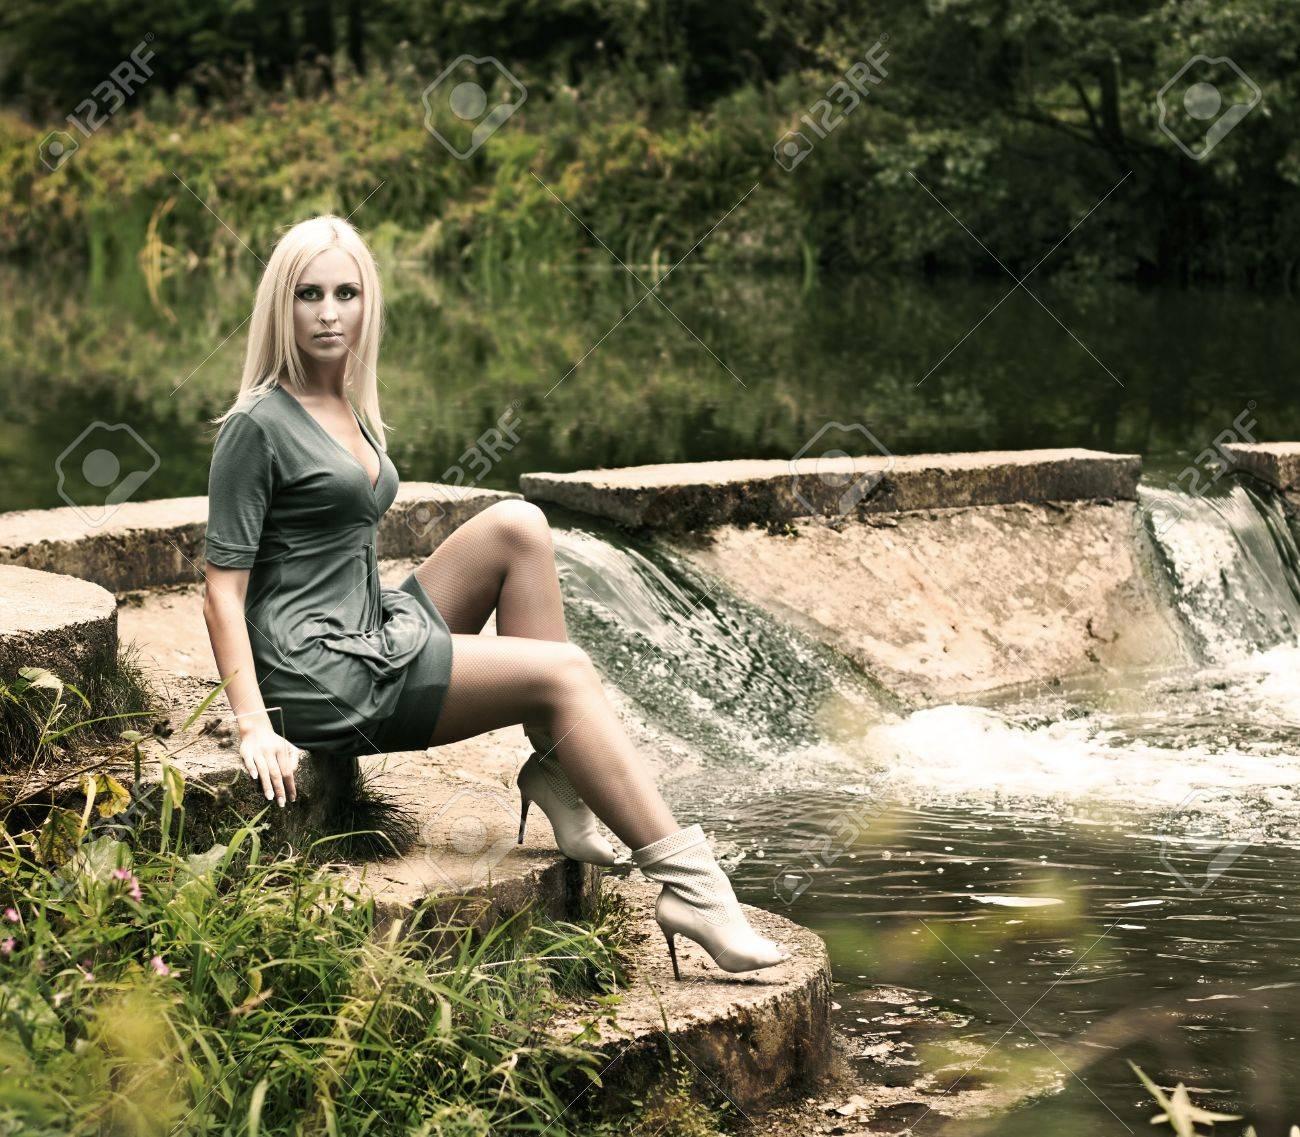 Fashion Photo of Blonde Woman Posing on Nature Background Stock Photo - 15918999